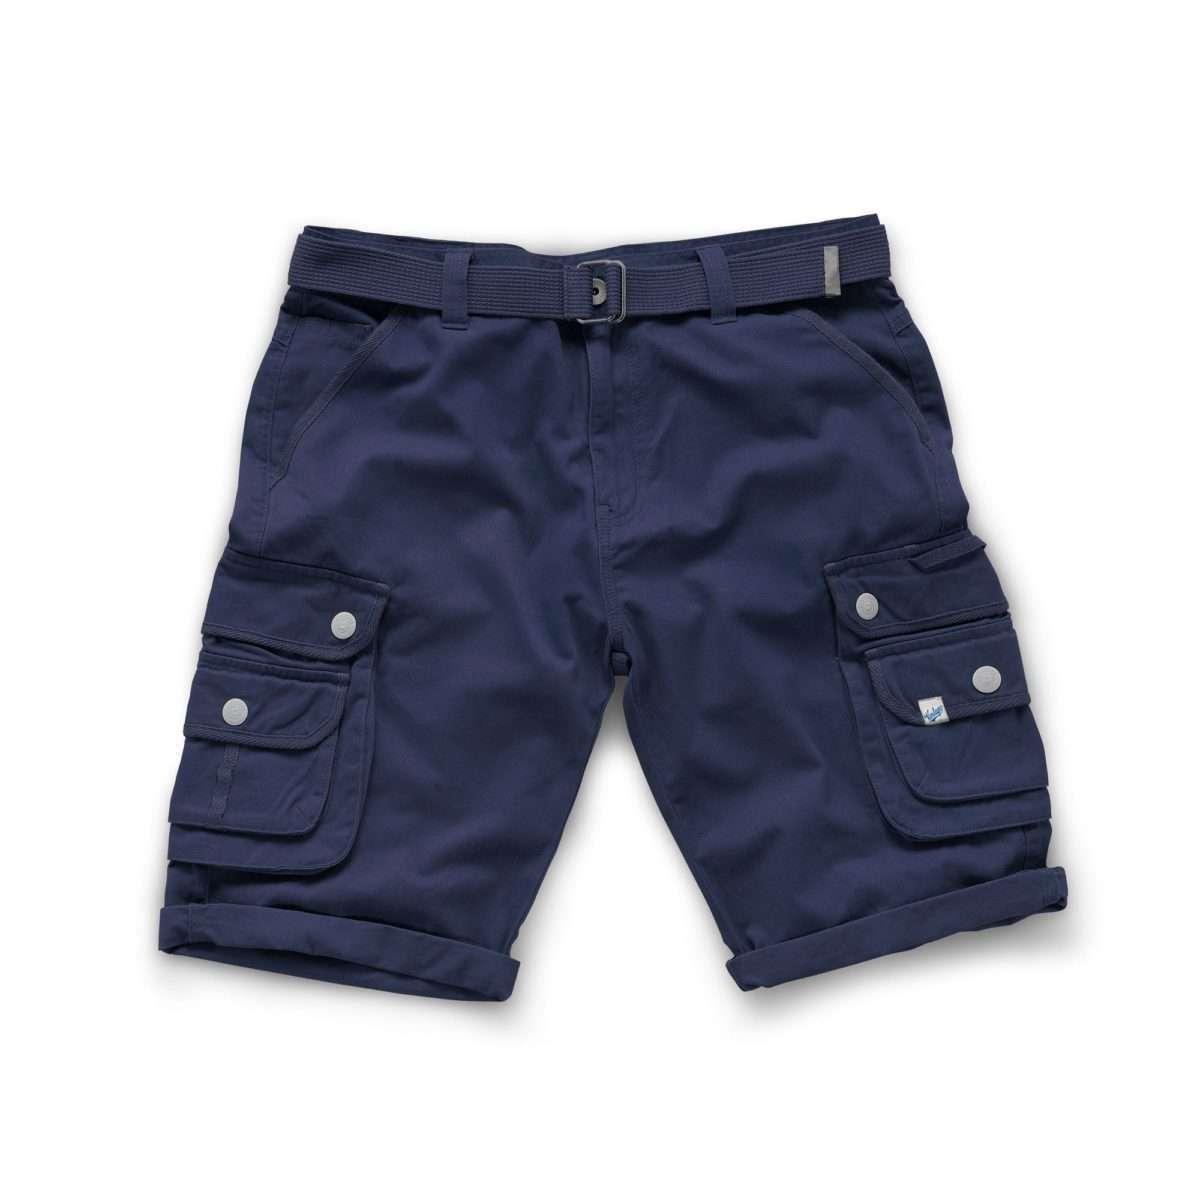 Scruffs Cargo Shorts